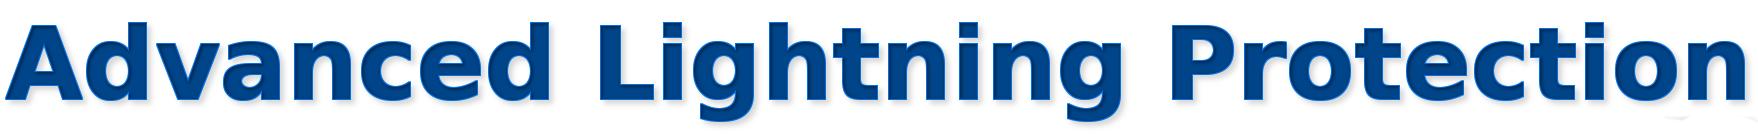 Advanced Lightning Protection Logo